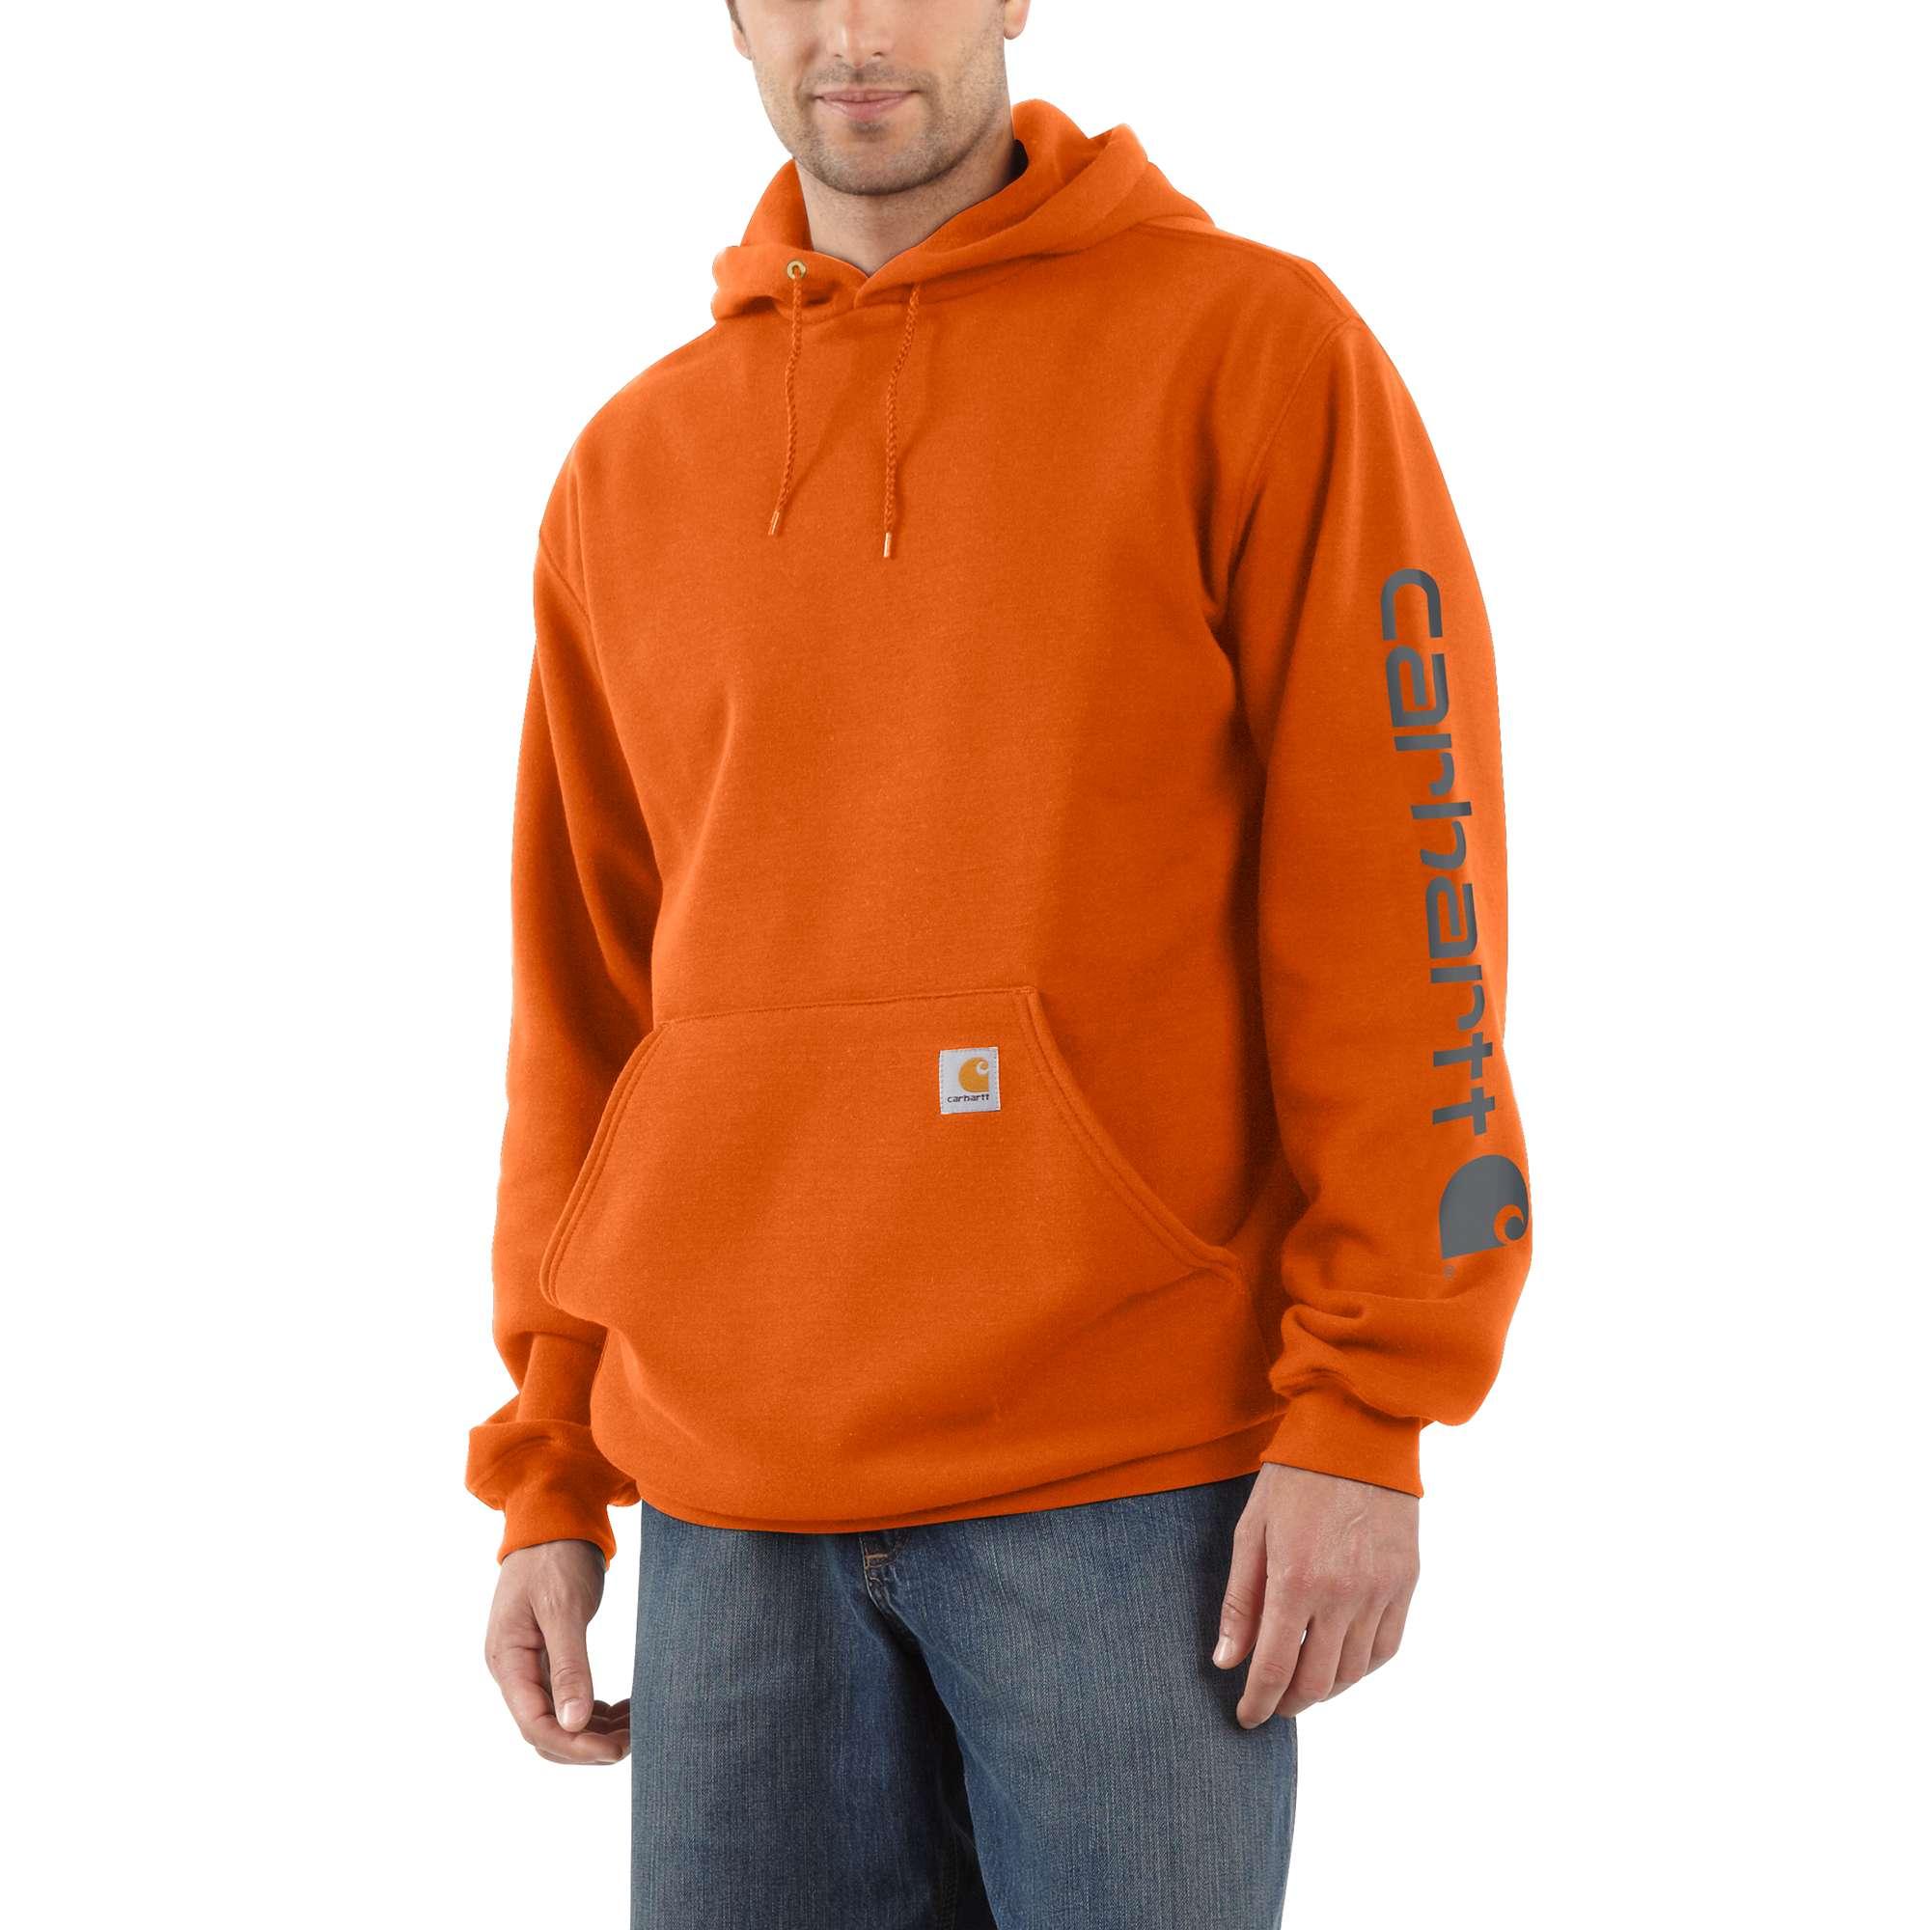 Men's Midweight Signature Logo Sleeve Hooded Sweat, Orange, swatch